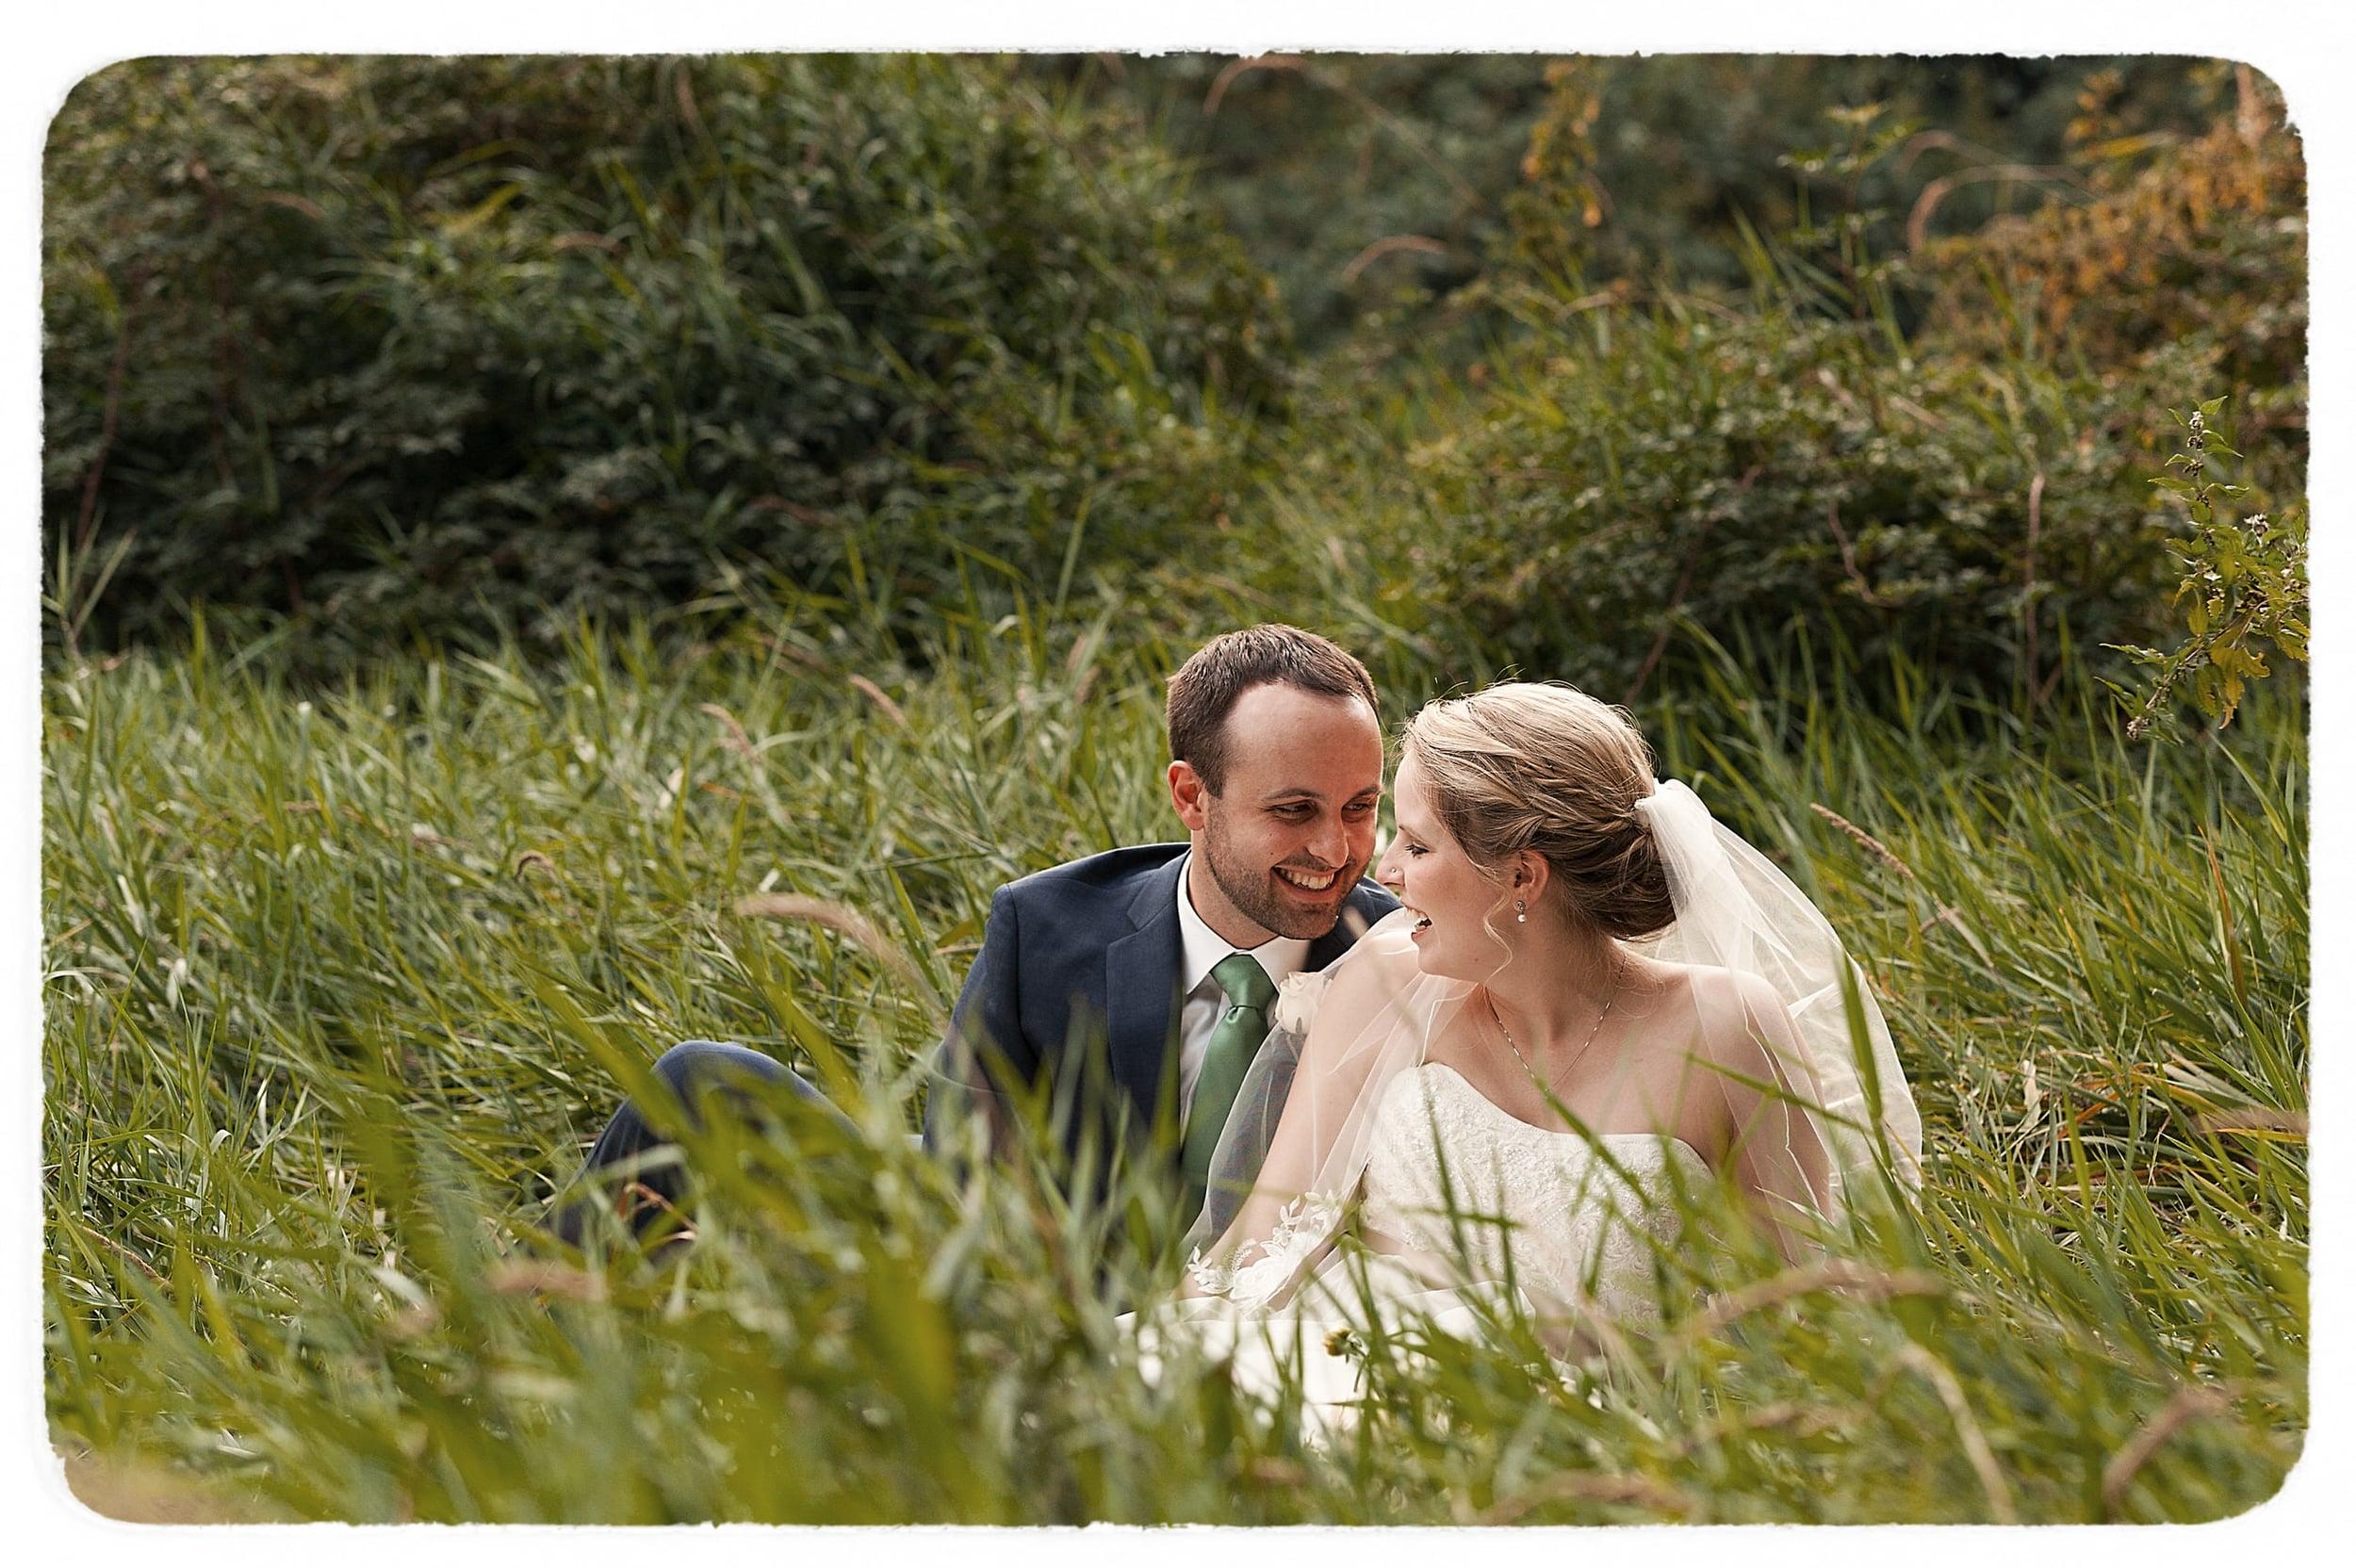 512 Kate&Marc-Wedding-OriginalCollection-512Film.jpg